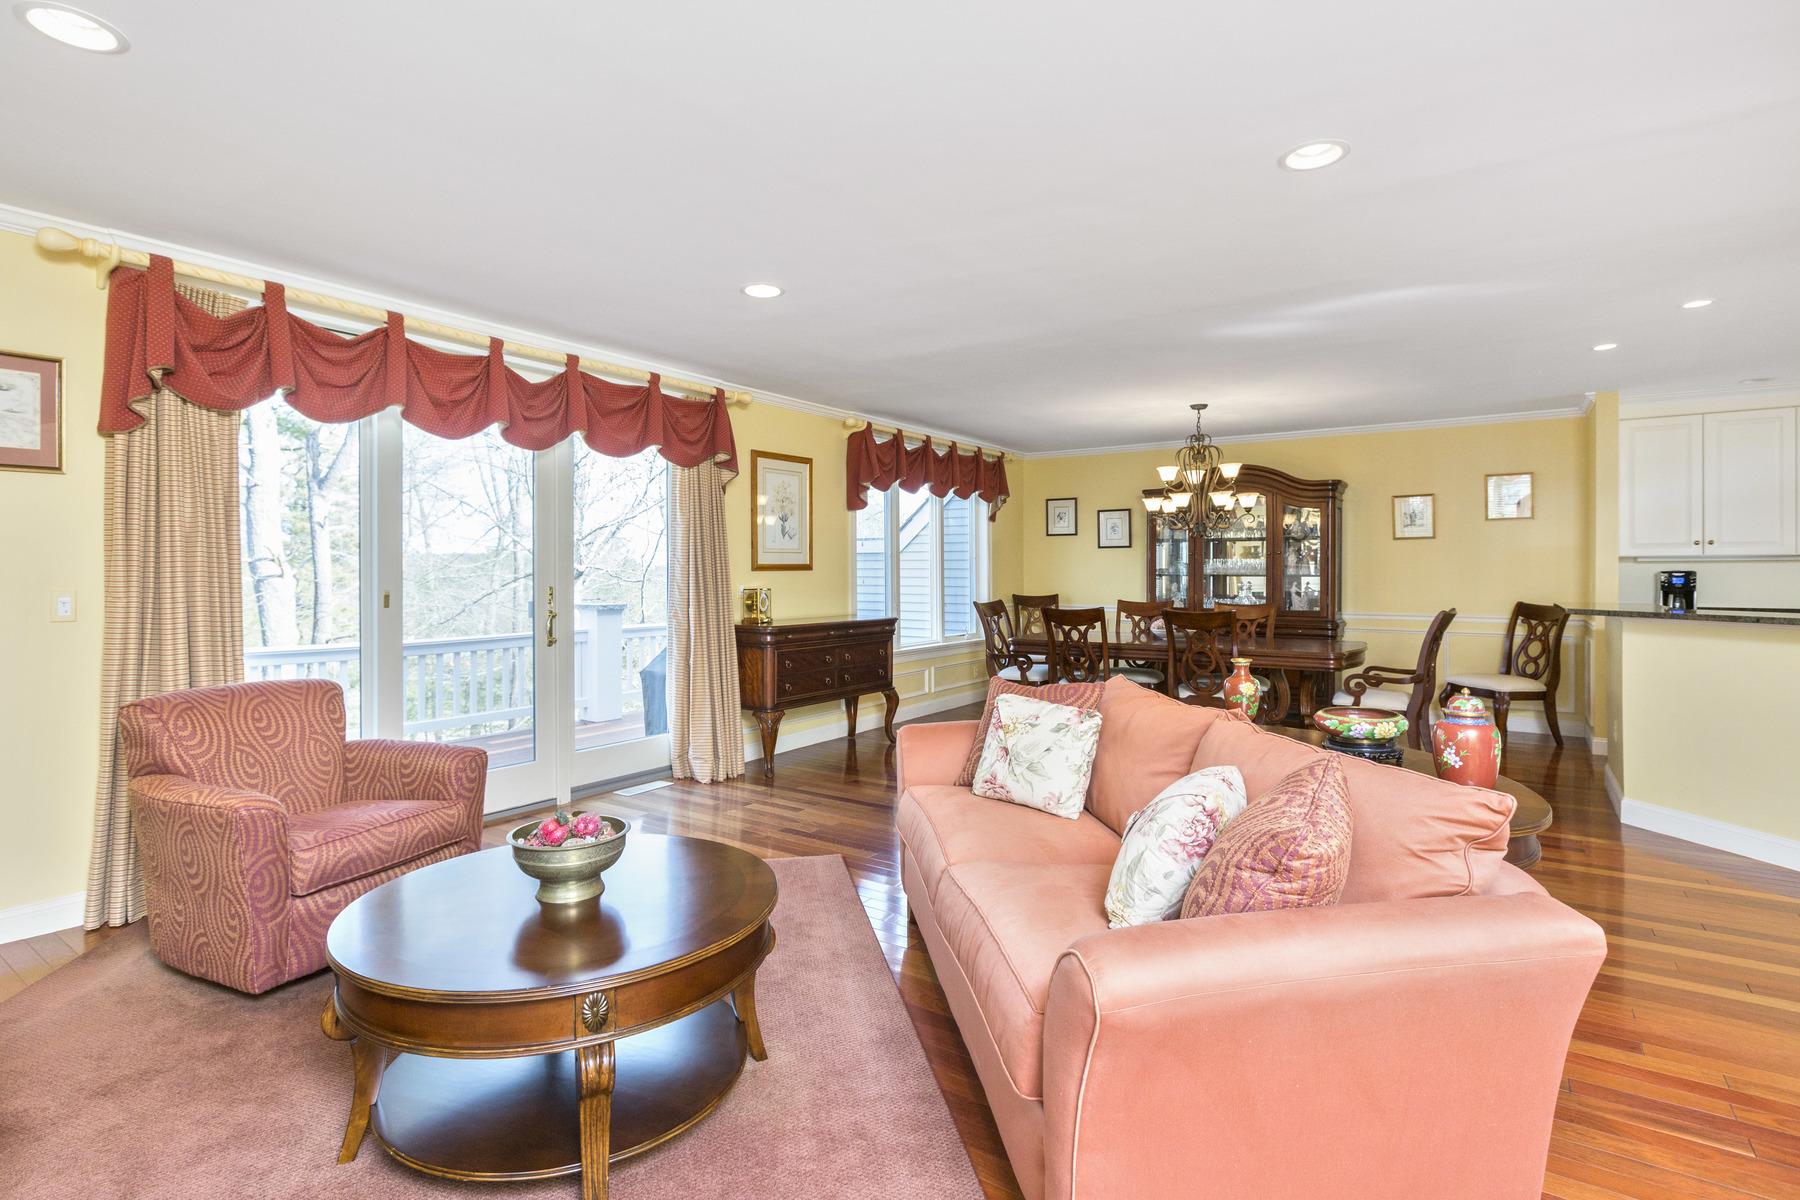 Villa per Vendita alle ore Desirable Floor Plan At Ipswich Country Club 32 Highwood Lane Ipswich, Massachusetts, 01938 Stati Uniti